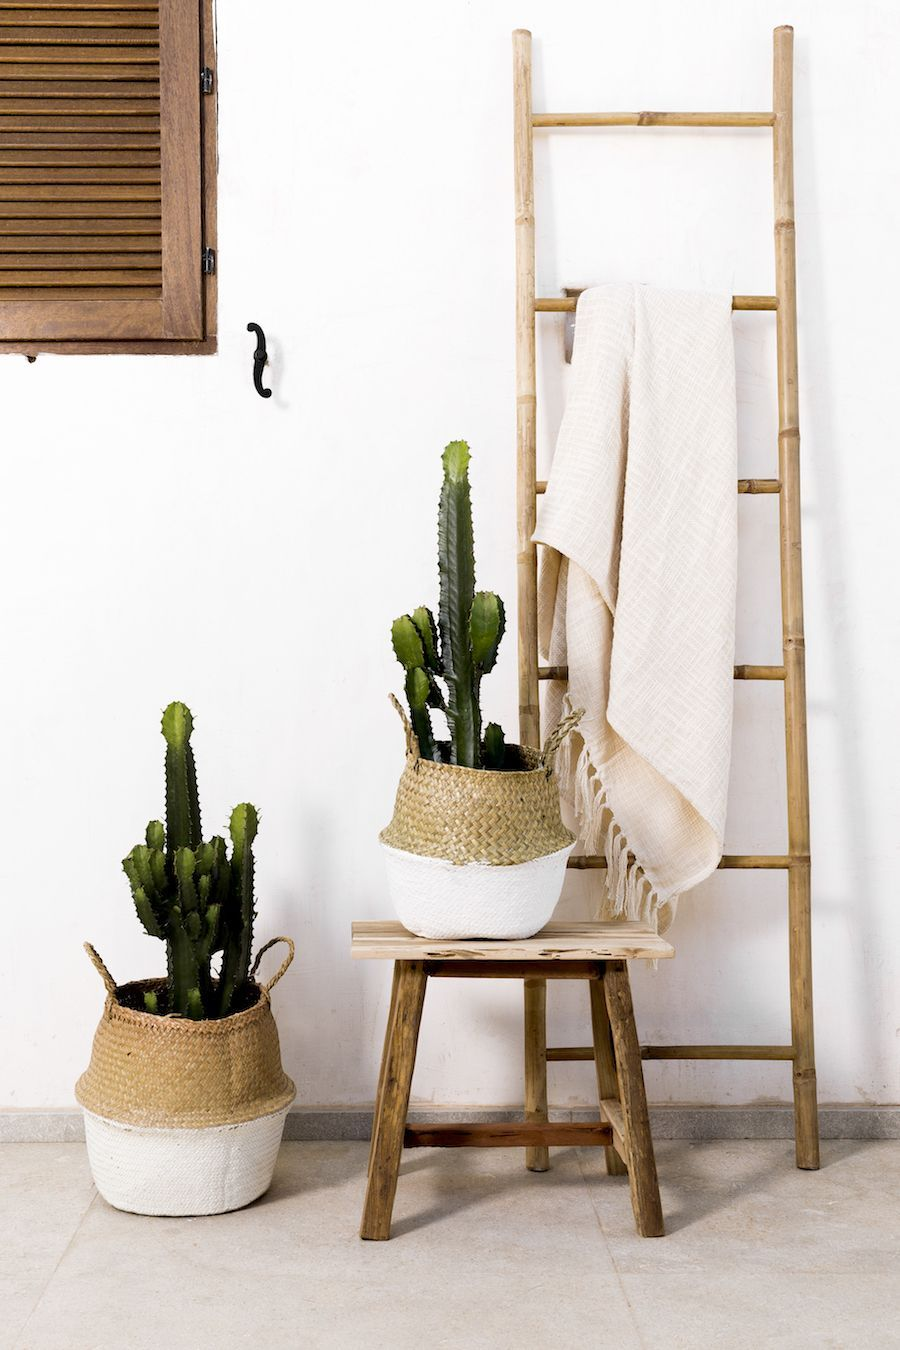 Bamboo escalera natural